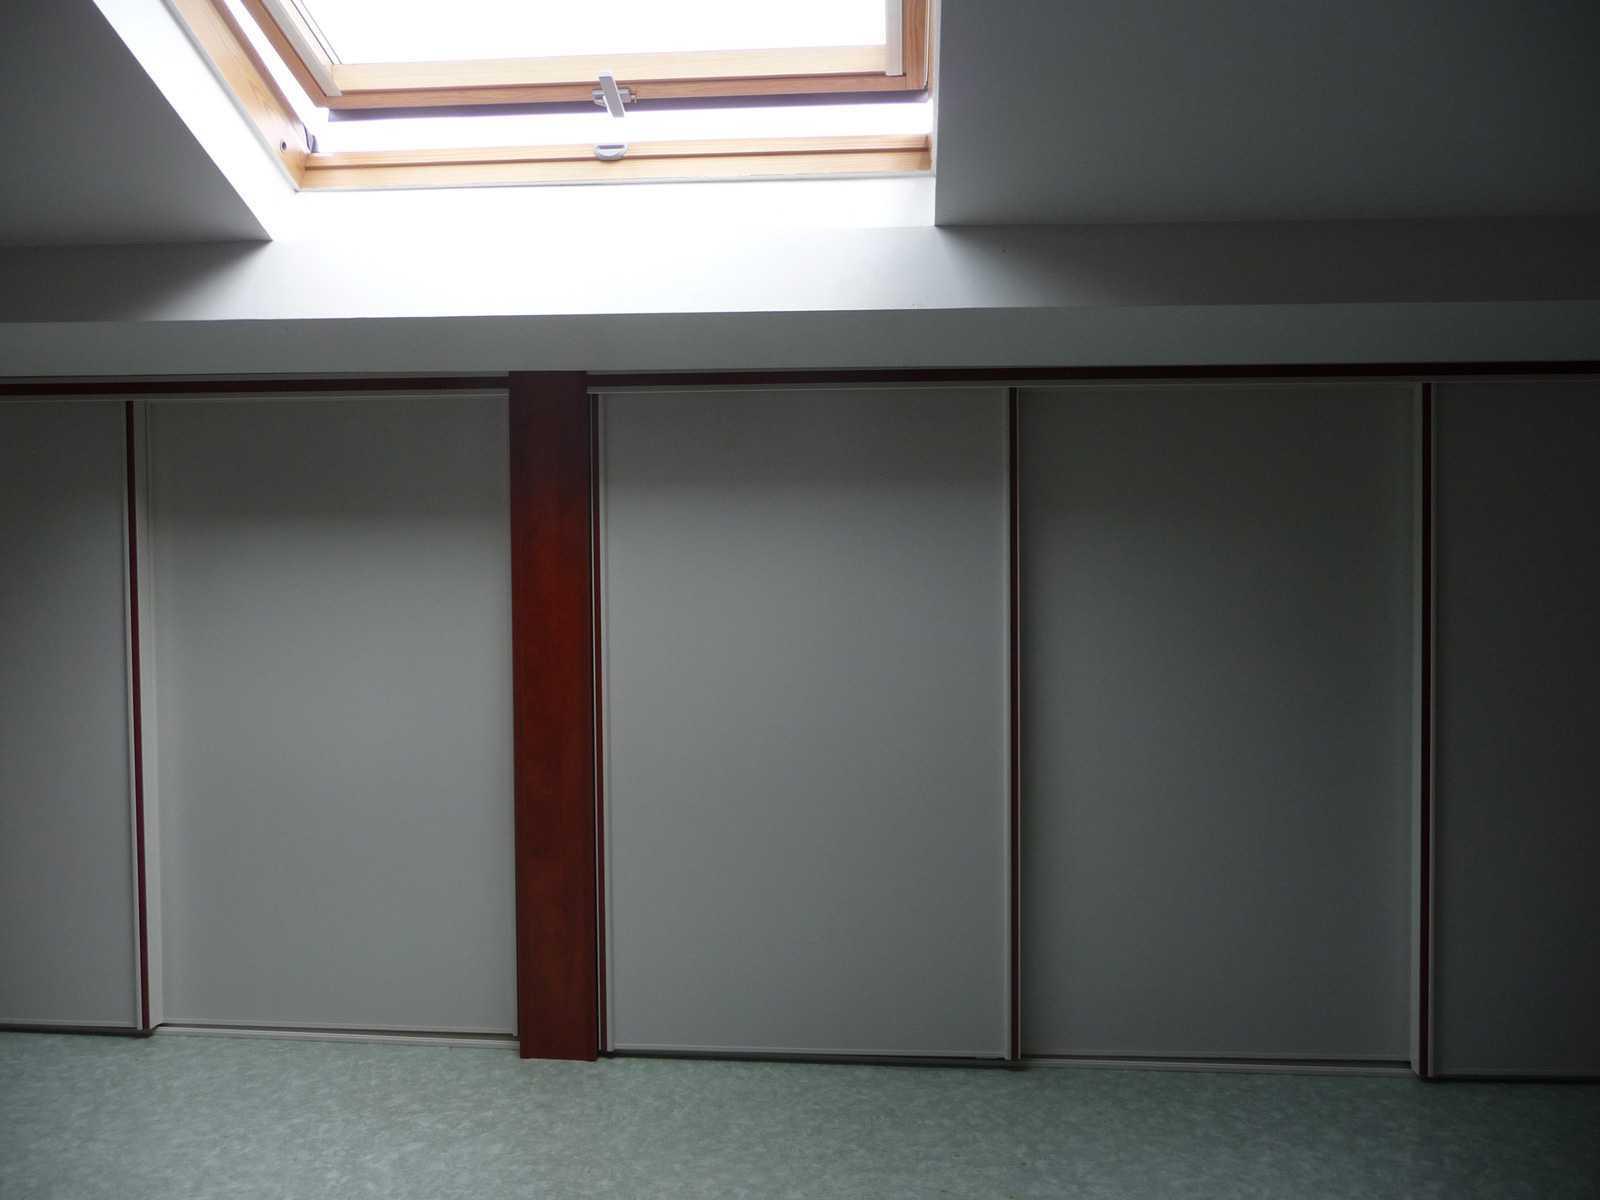 #926239 Portes Coulissantes Placard Free Pictures Finder 1119 armoires portes coulissantes castorama 1600x1200 px @ aertt.com